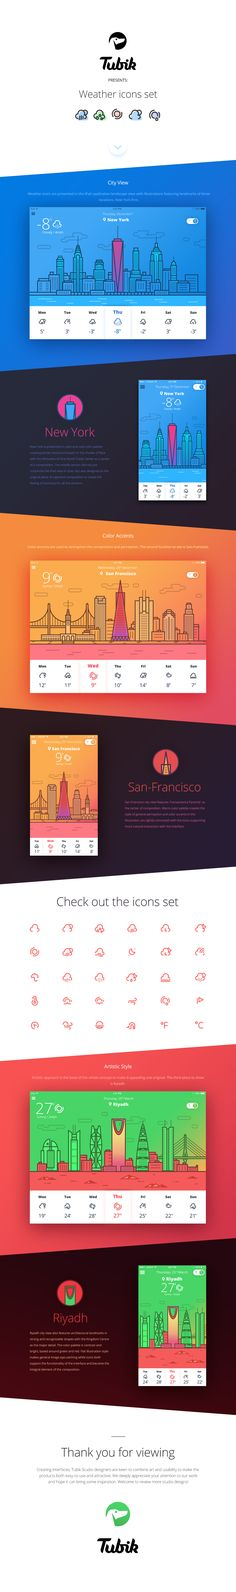 UI Inspiration: Layouts | Abduzeedo Design Inspiration